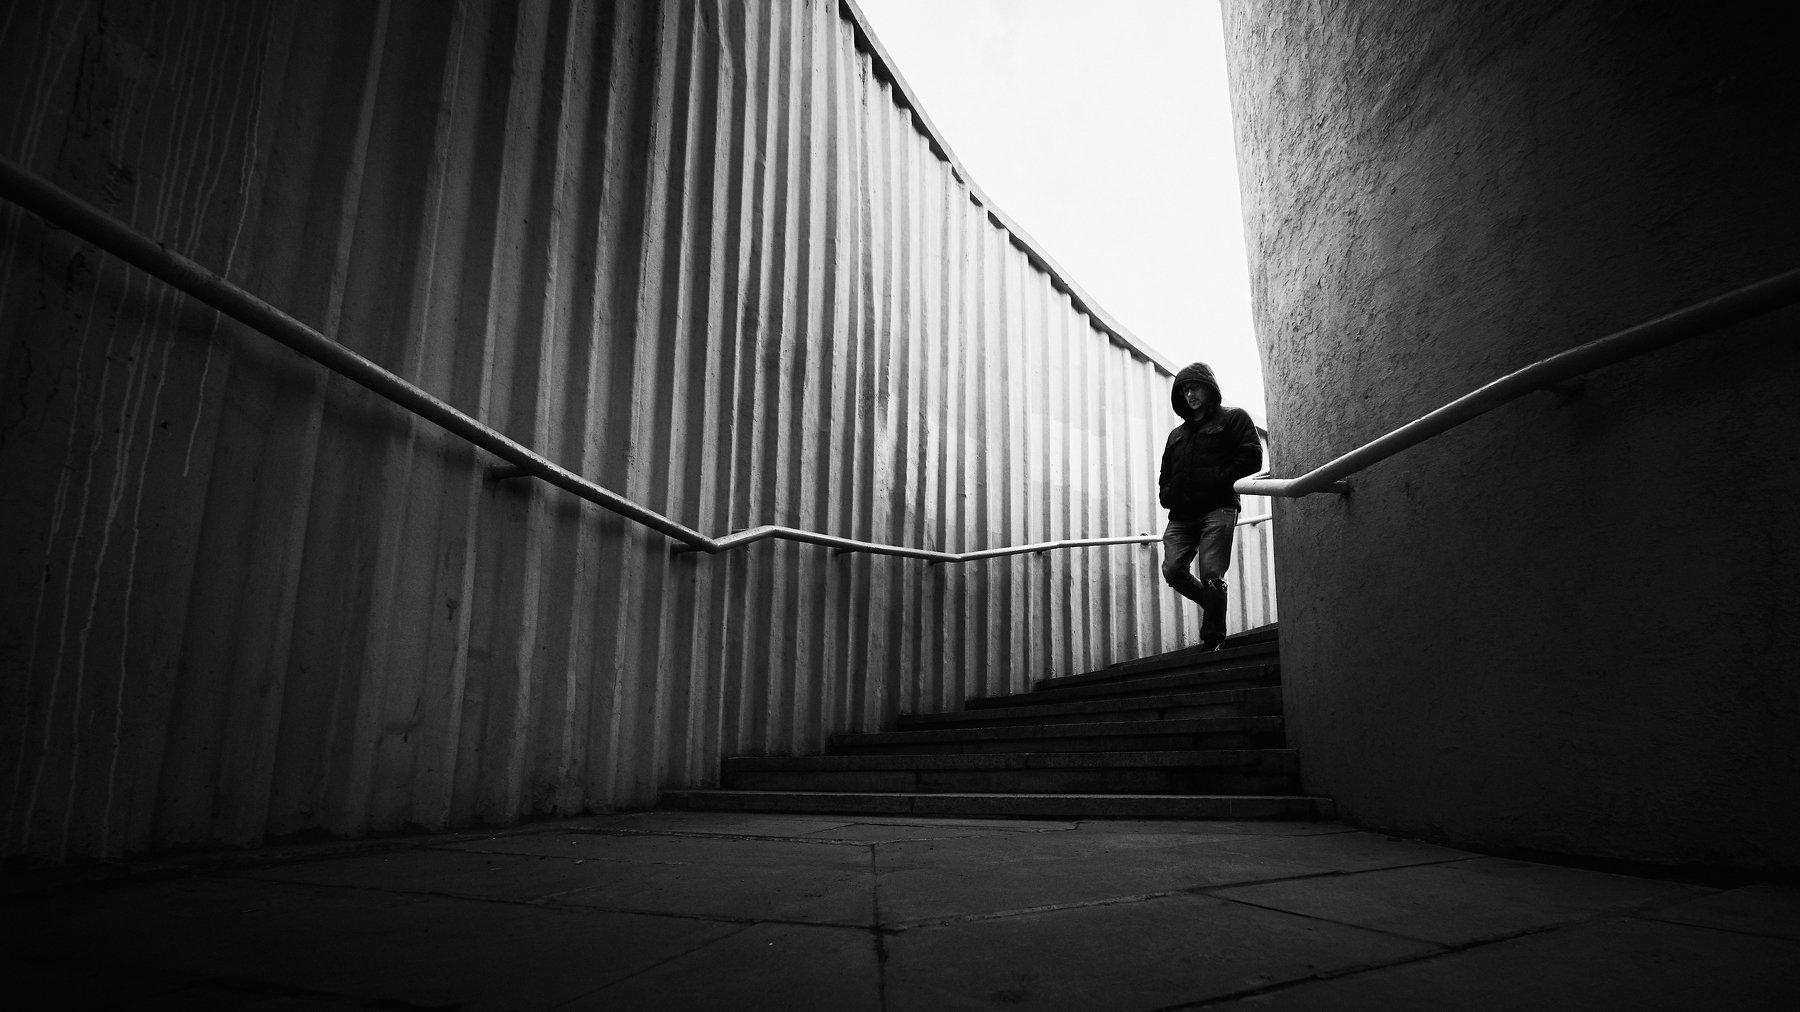 man, alone, steps, stairs, alone, light, shadow, city, street, walk, walking, Кыштымов Максим